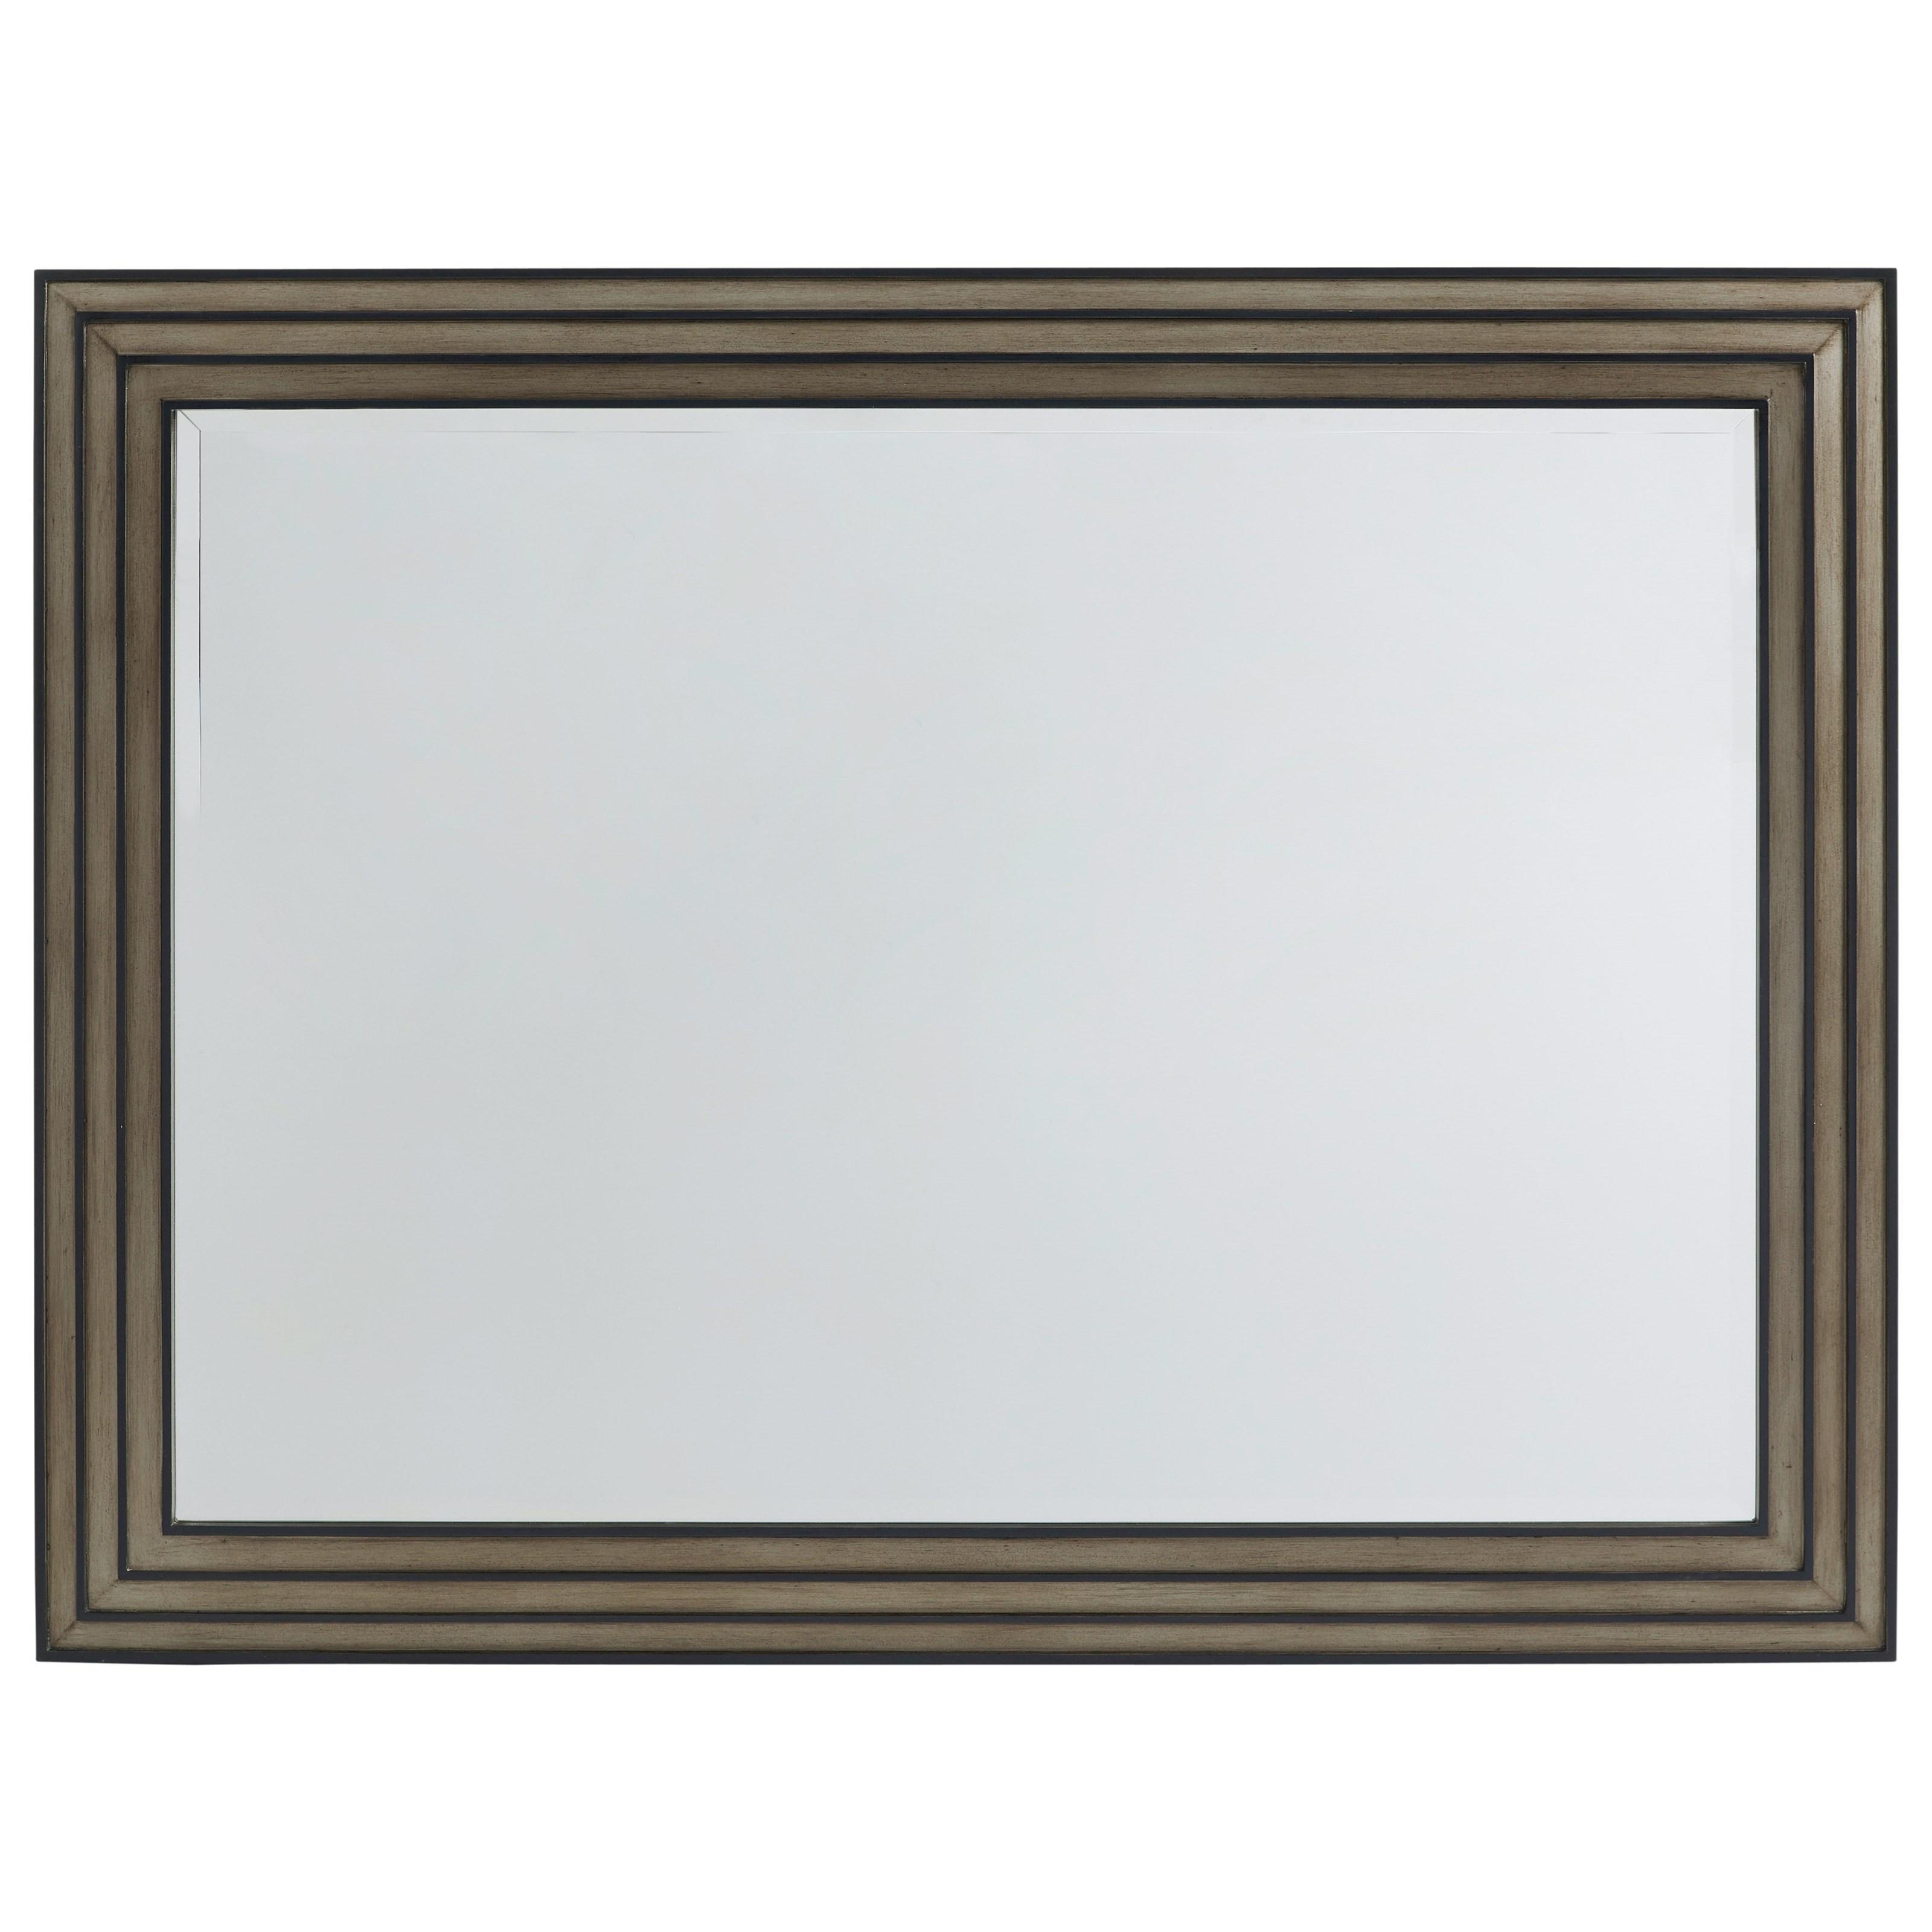 Ariana Miranda Rectangular Mirror by Lexington at Baer's Furniture